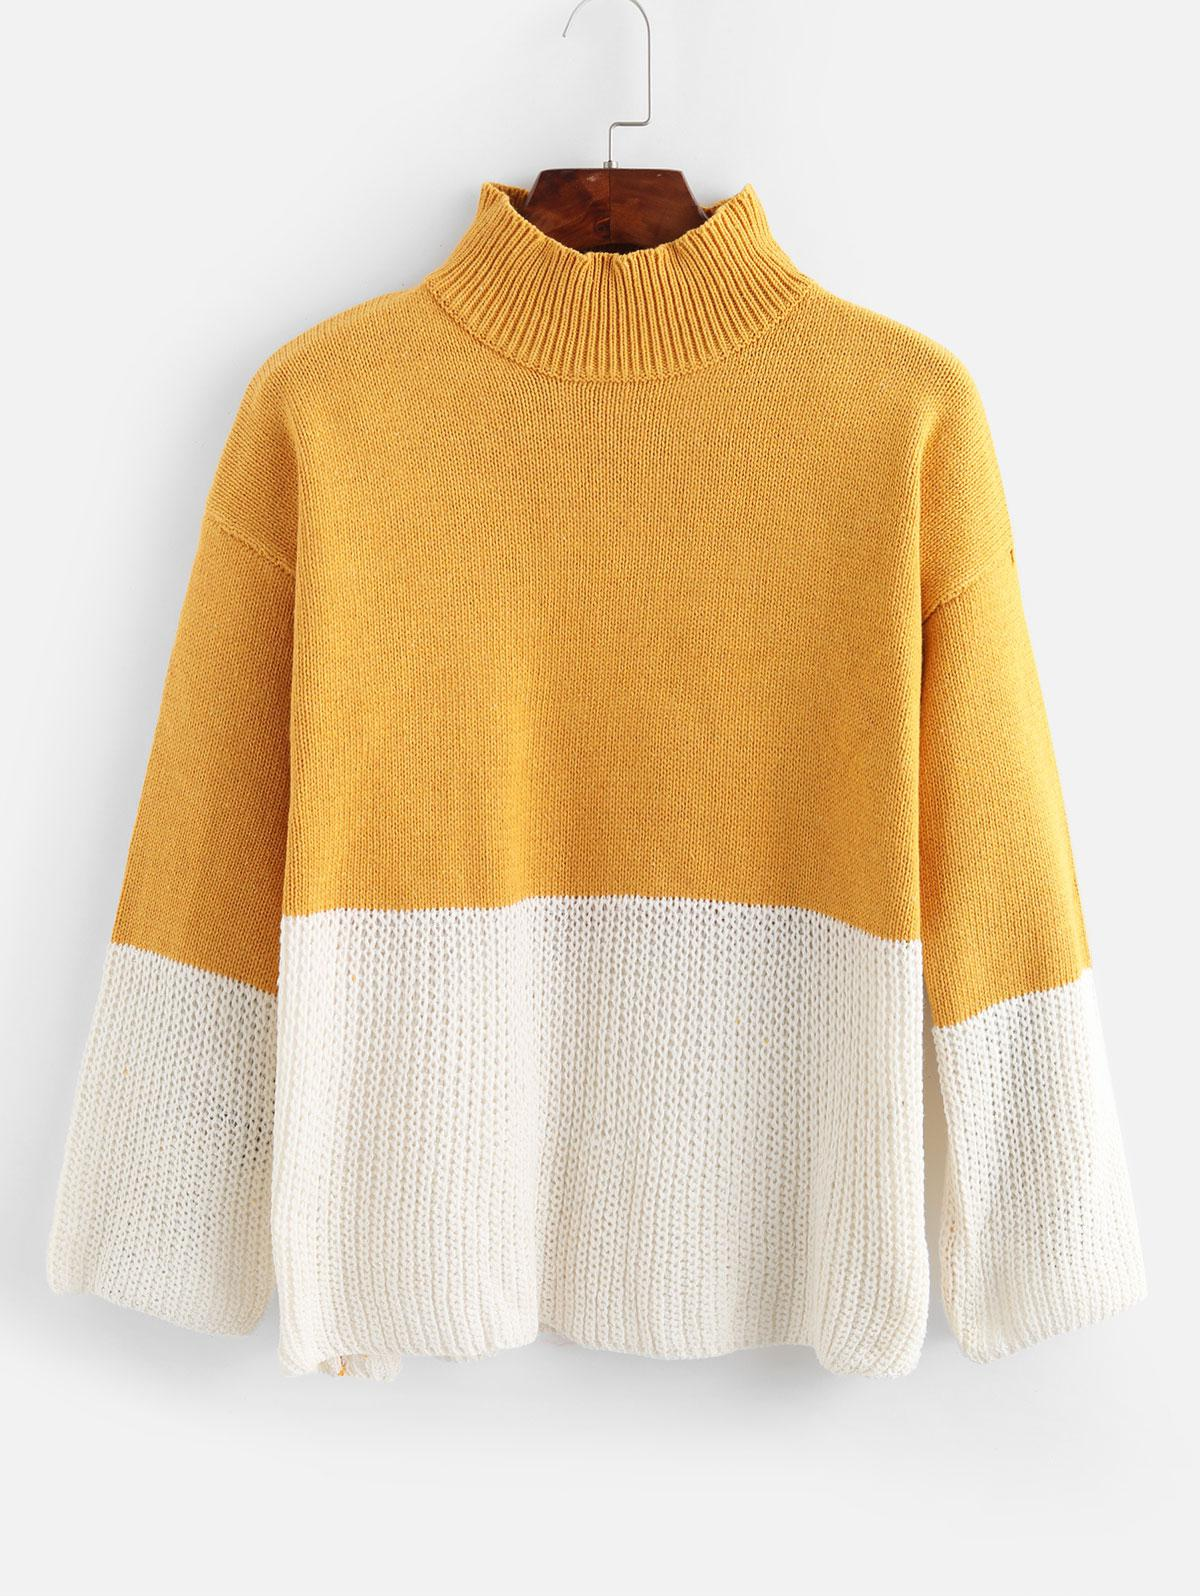 Drop Shoulder Mock Neck Two Tone Sweater